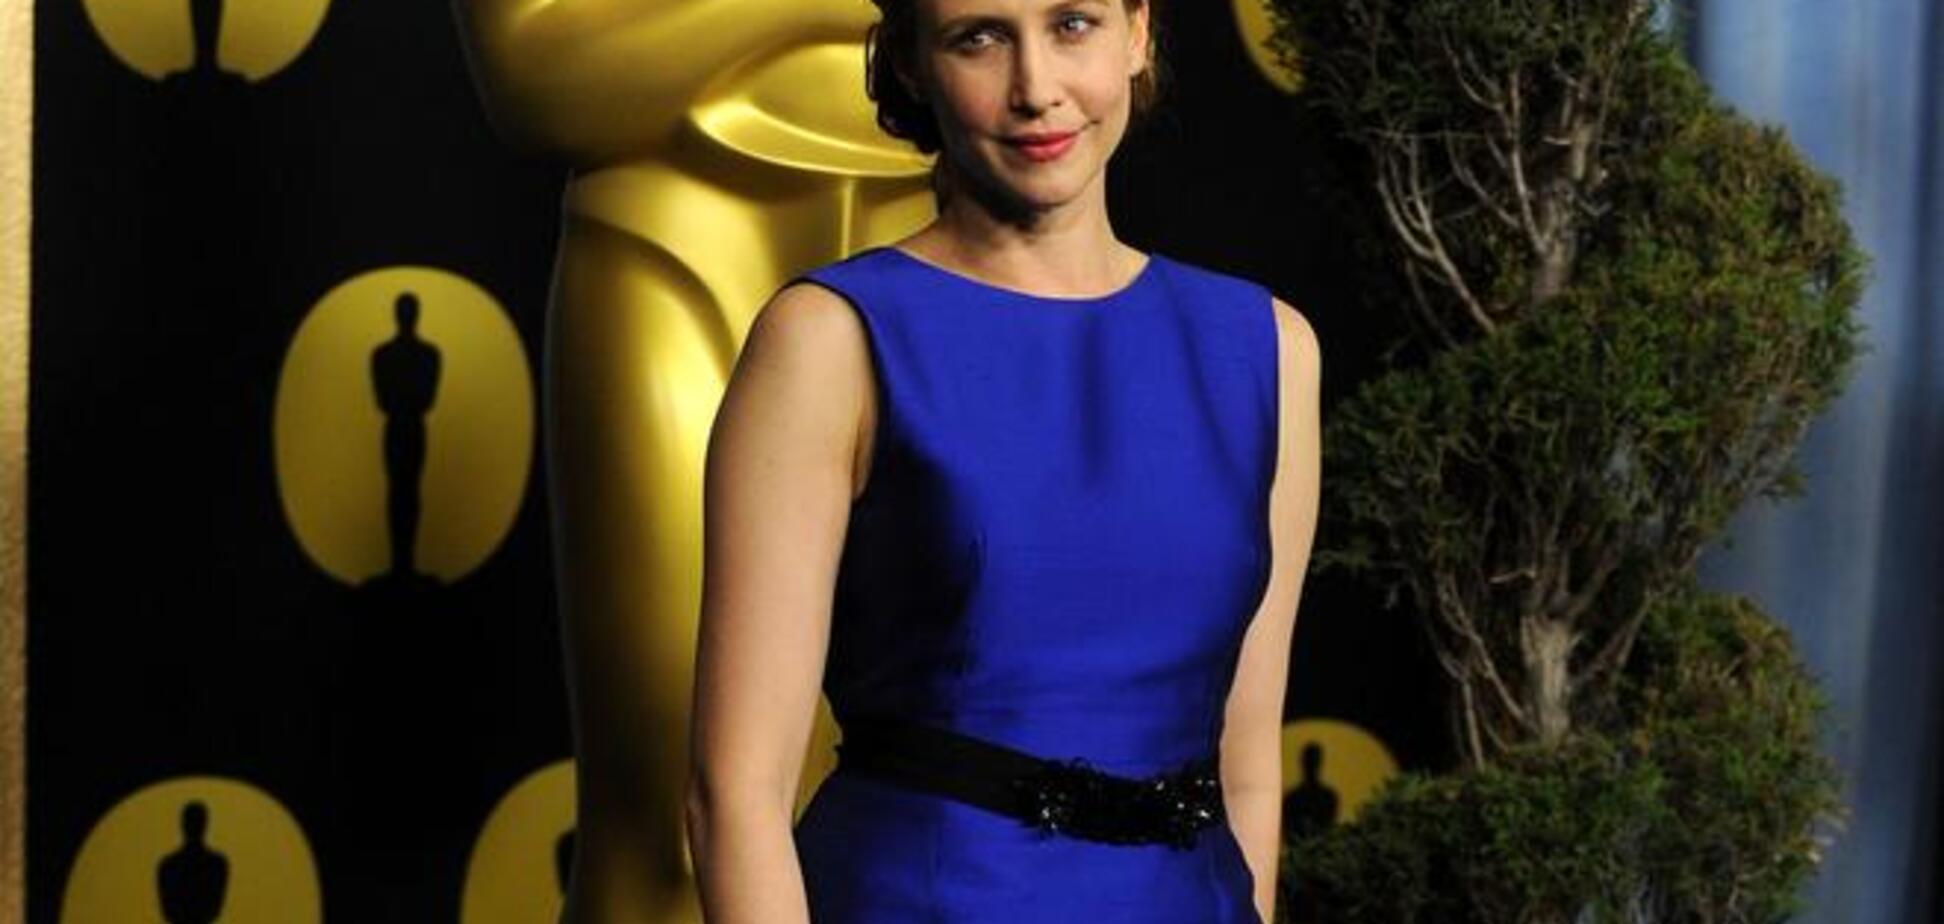 Номінантка на 'Оскар' назвала Путіна 'гов ... м'